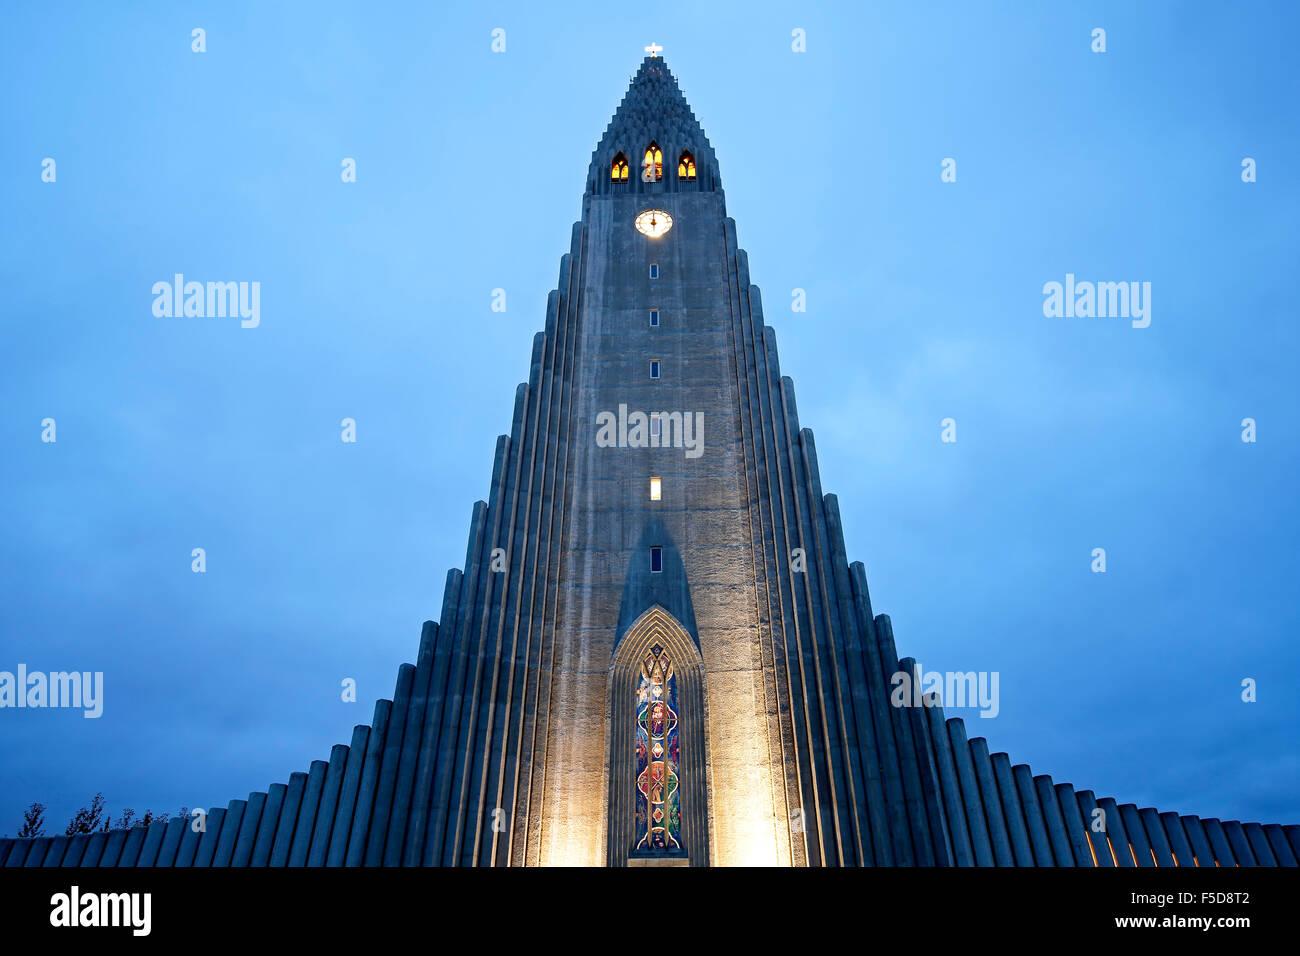 Hallgrims-Kirche (Hallgrimskirkja durch staatliche Architekten Guðjón Samúelsson), Reykjavik, Island Stockbild